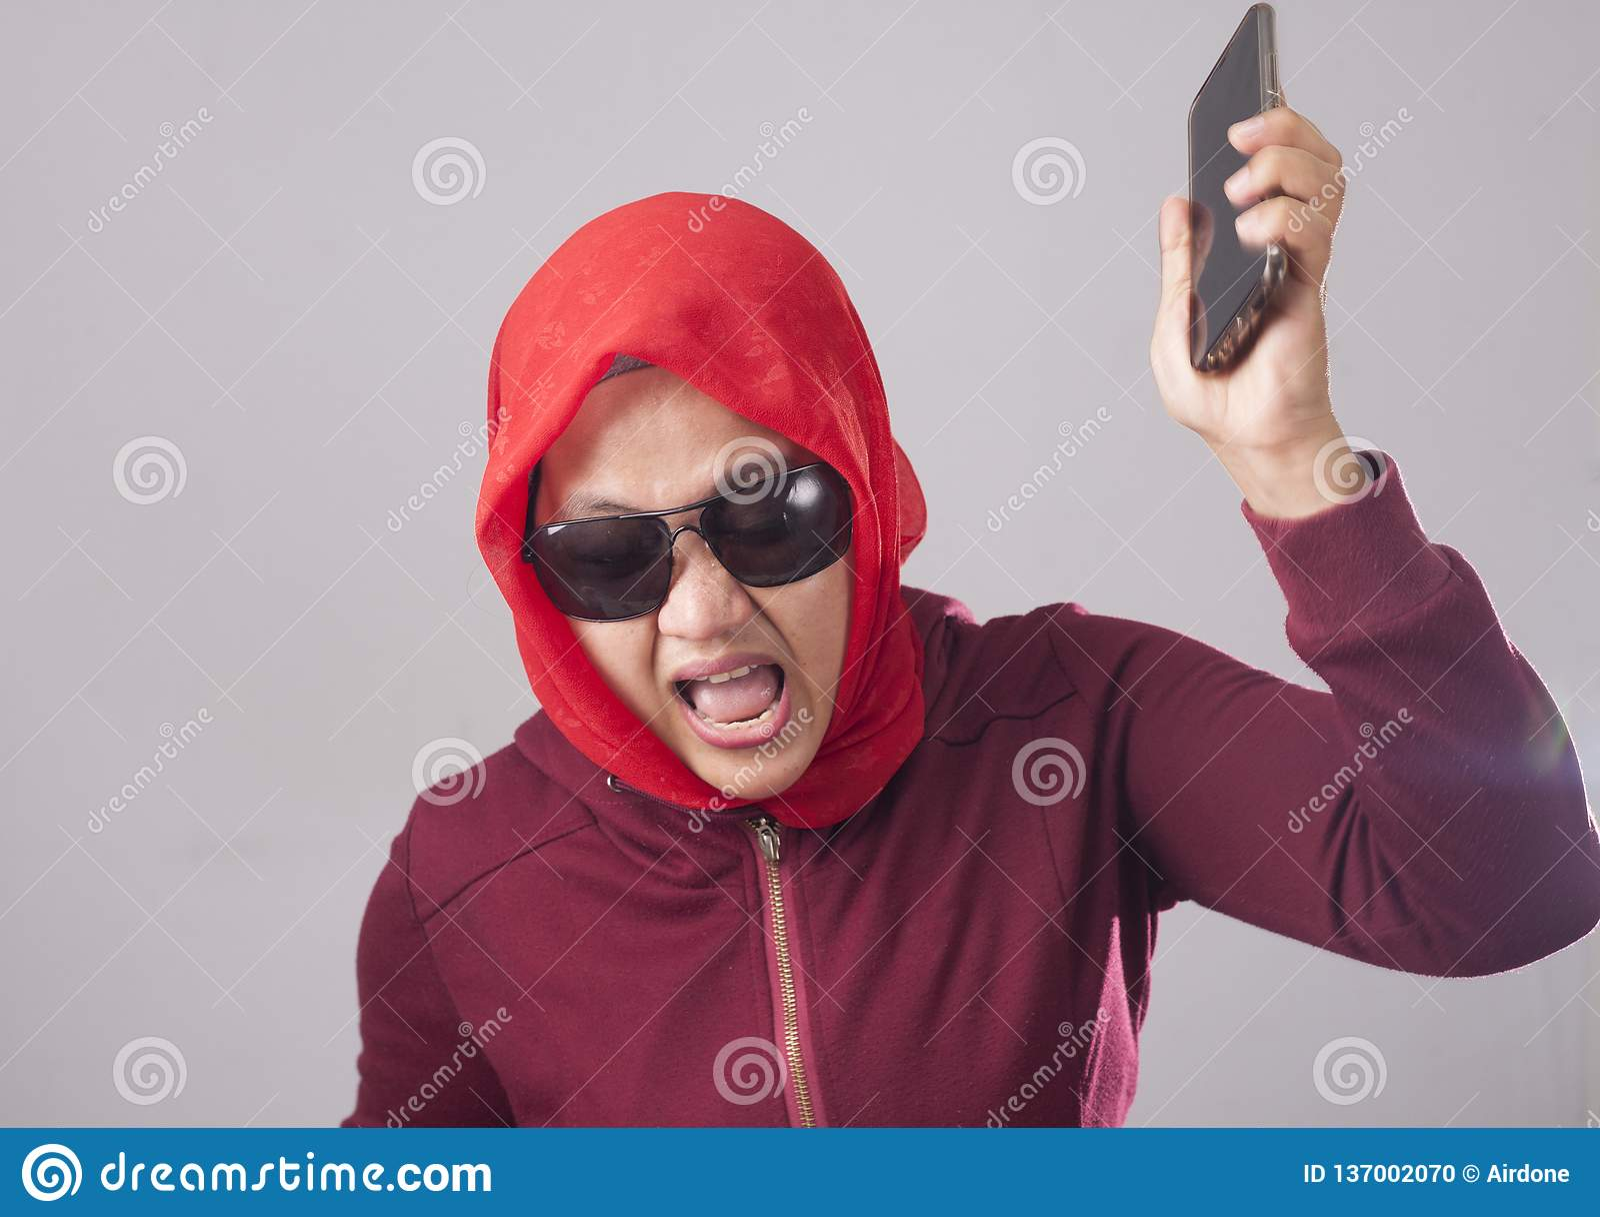 Teleurgesteld Boze Moslimdame Throwing Her Phone